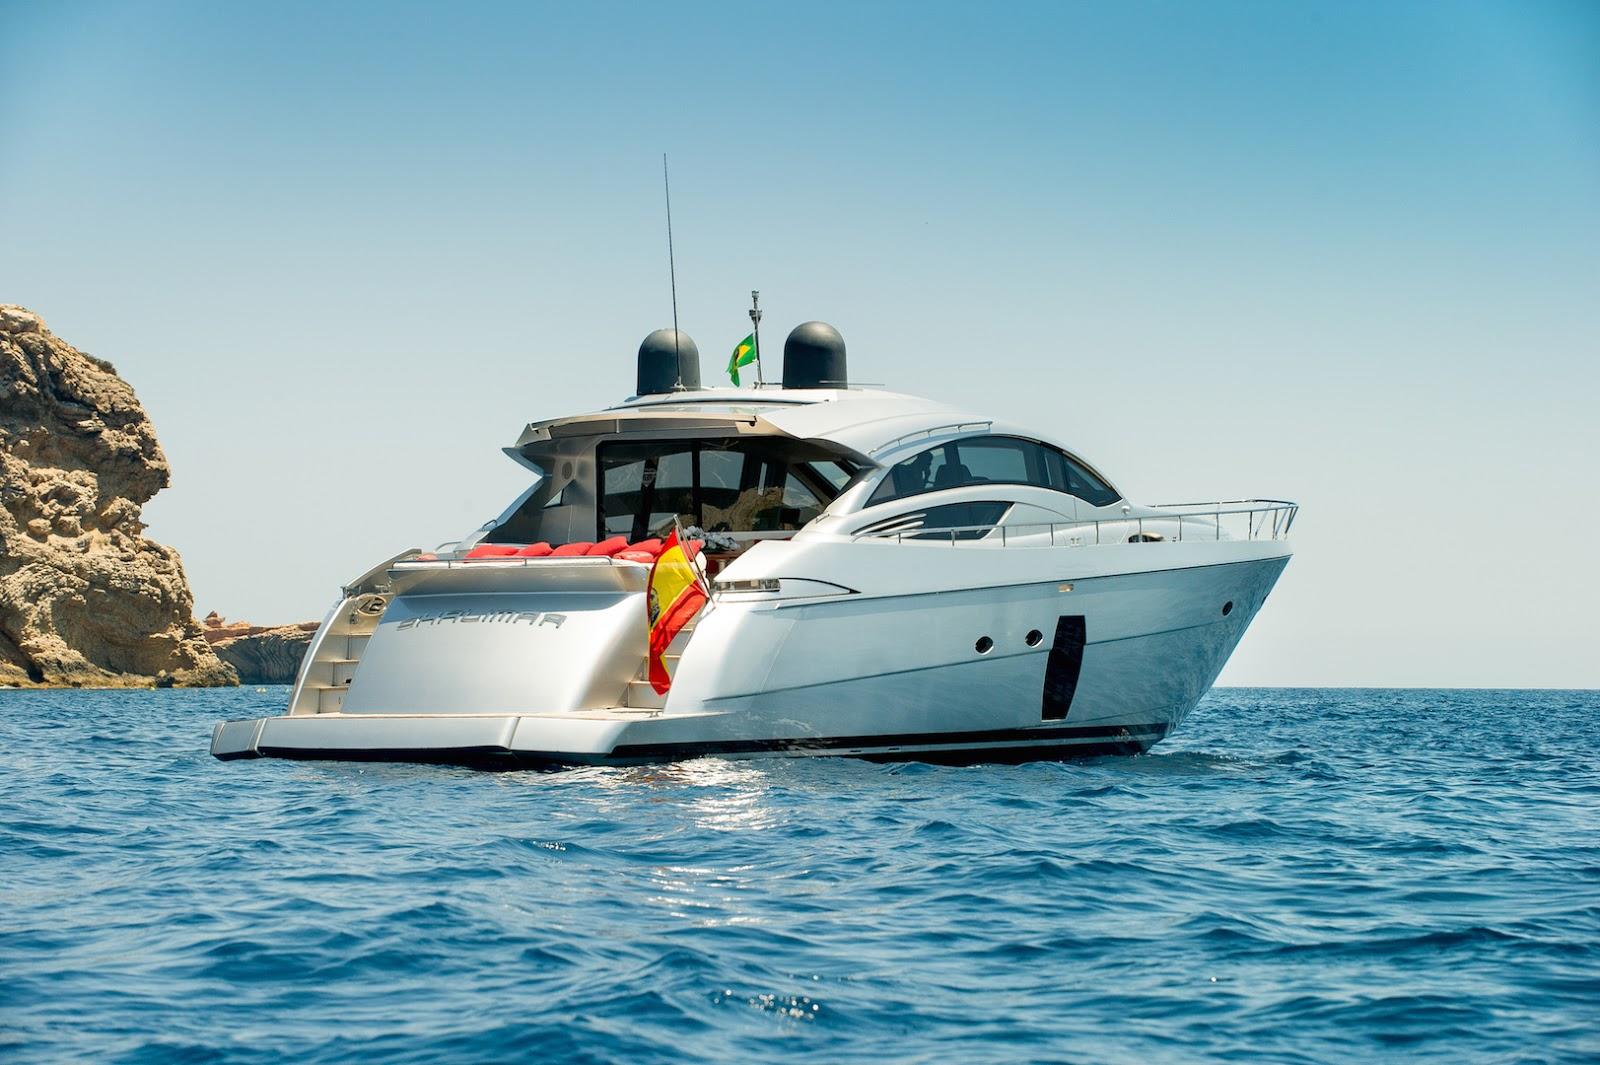 alquiler de yates en ibiza alquiler barcos ibiza alquiler de barcos en ibiza